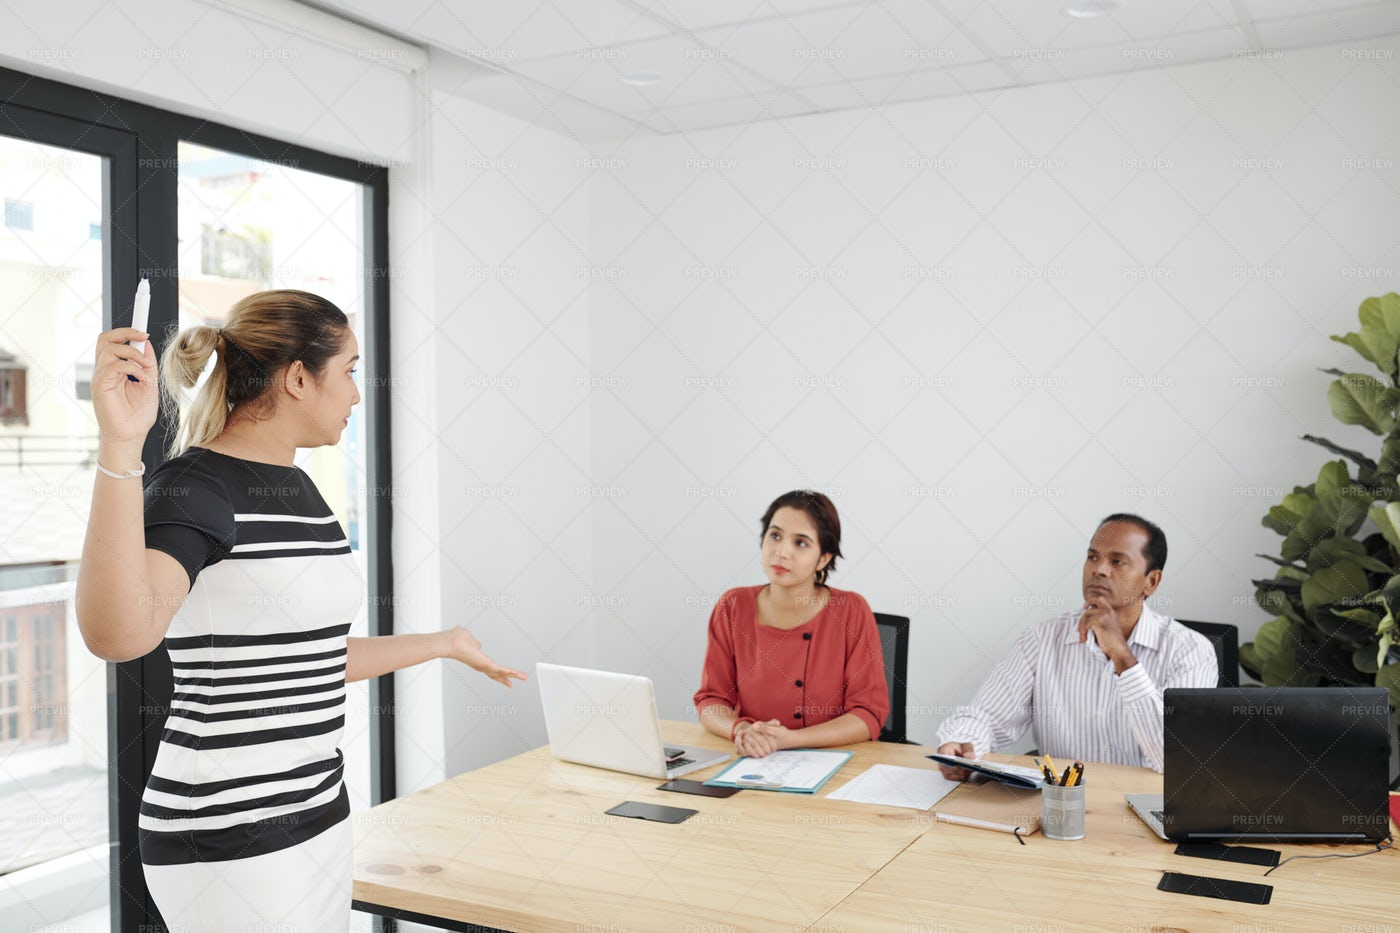 Business Seminar At Office: Stock Photos